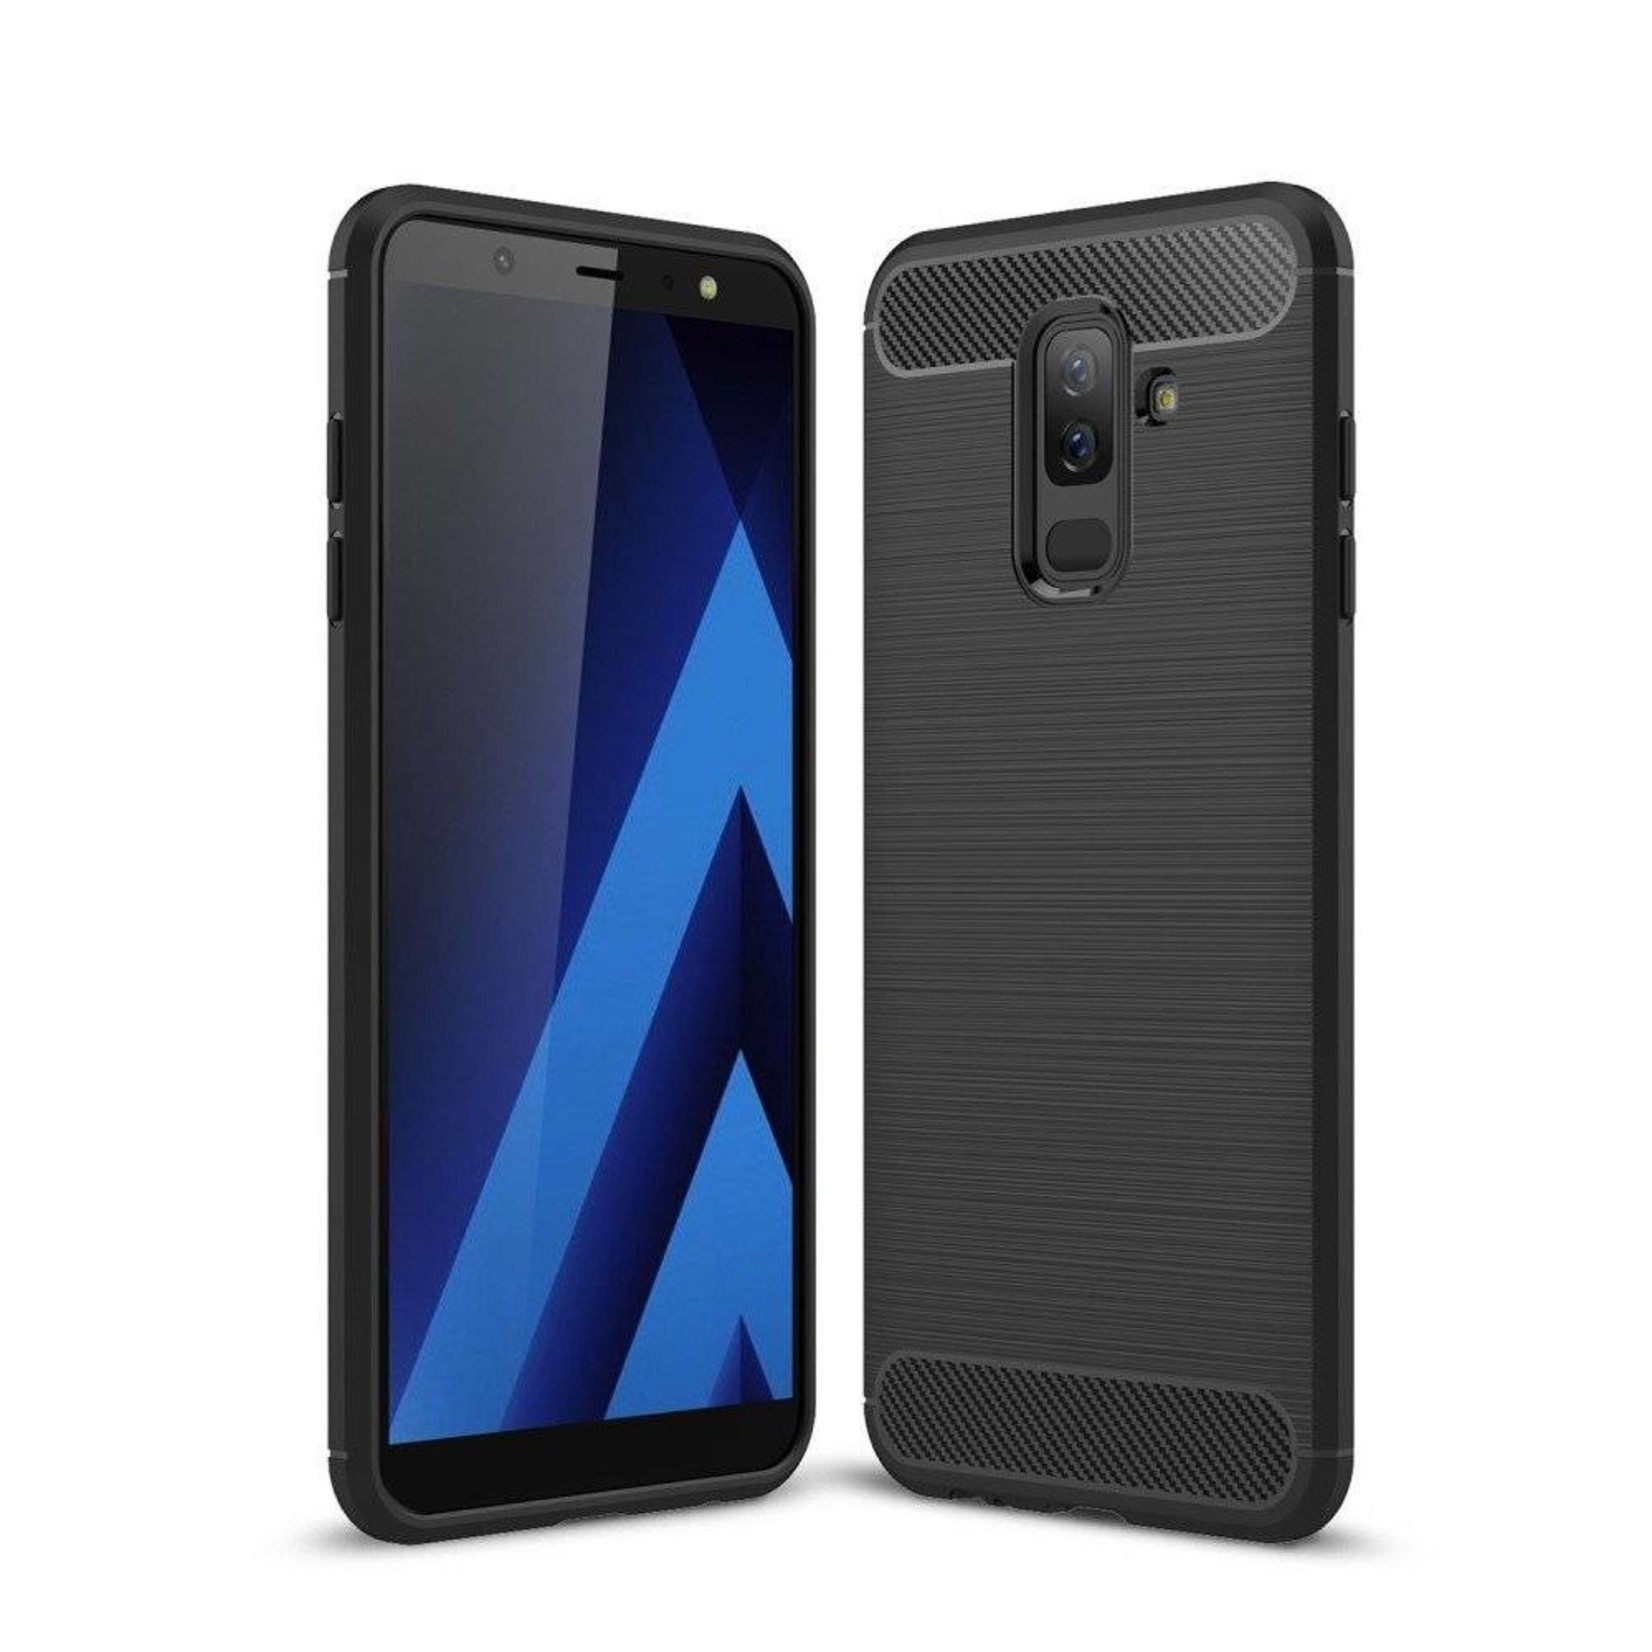 Colorfone Hoesje Armour 1 Samsung A6 Plus Zwart